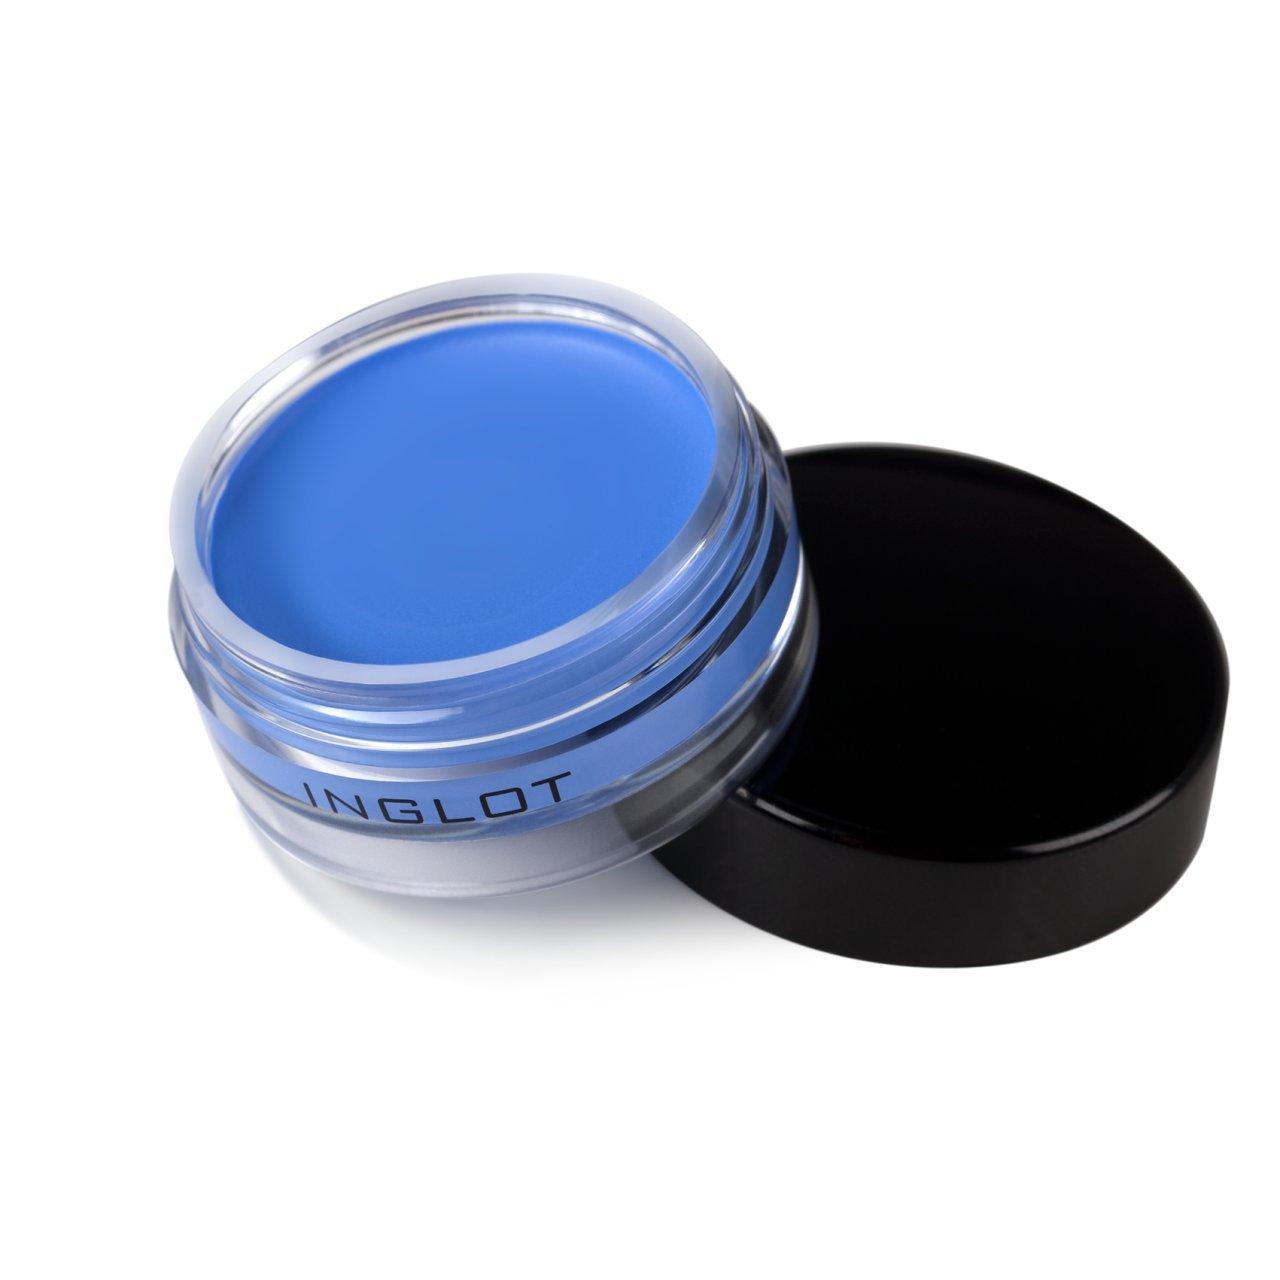 Inglot Cosmetics AMC Cheap mail order sales Eyeliner Gel 70 Max 51% OFF 5.5g Oz Us 0.19